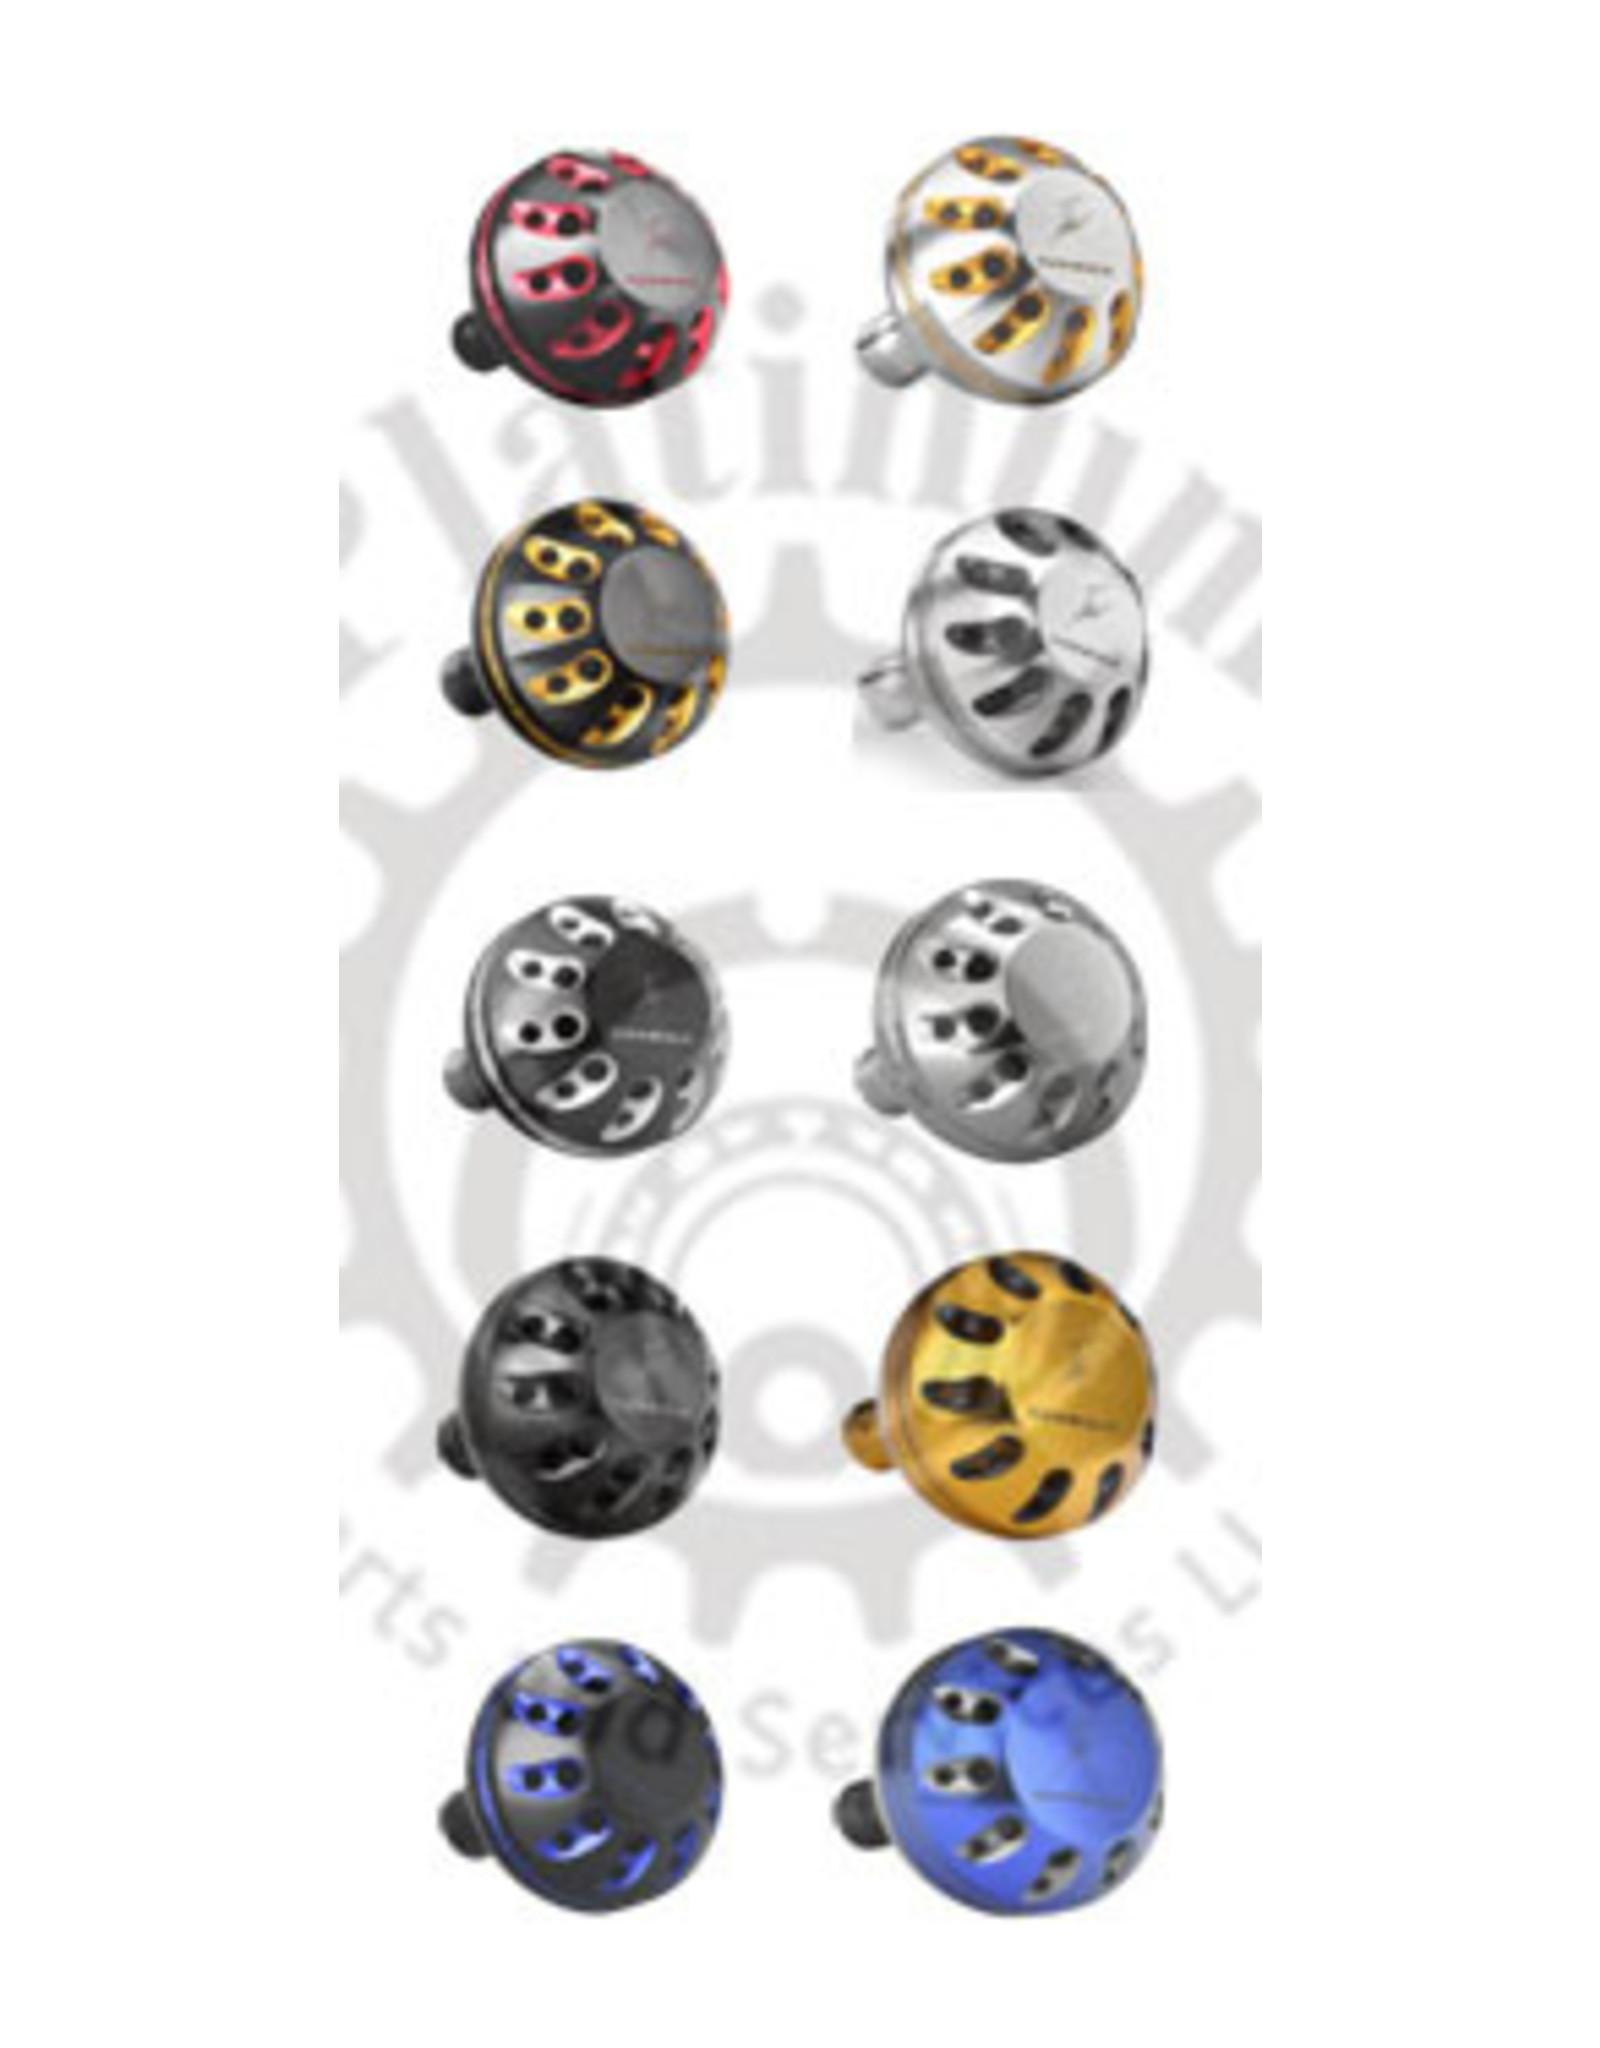 Gomexus Gomexus Round Alum CNC Power Knob